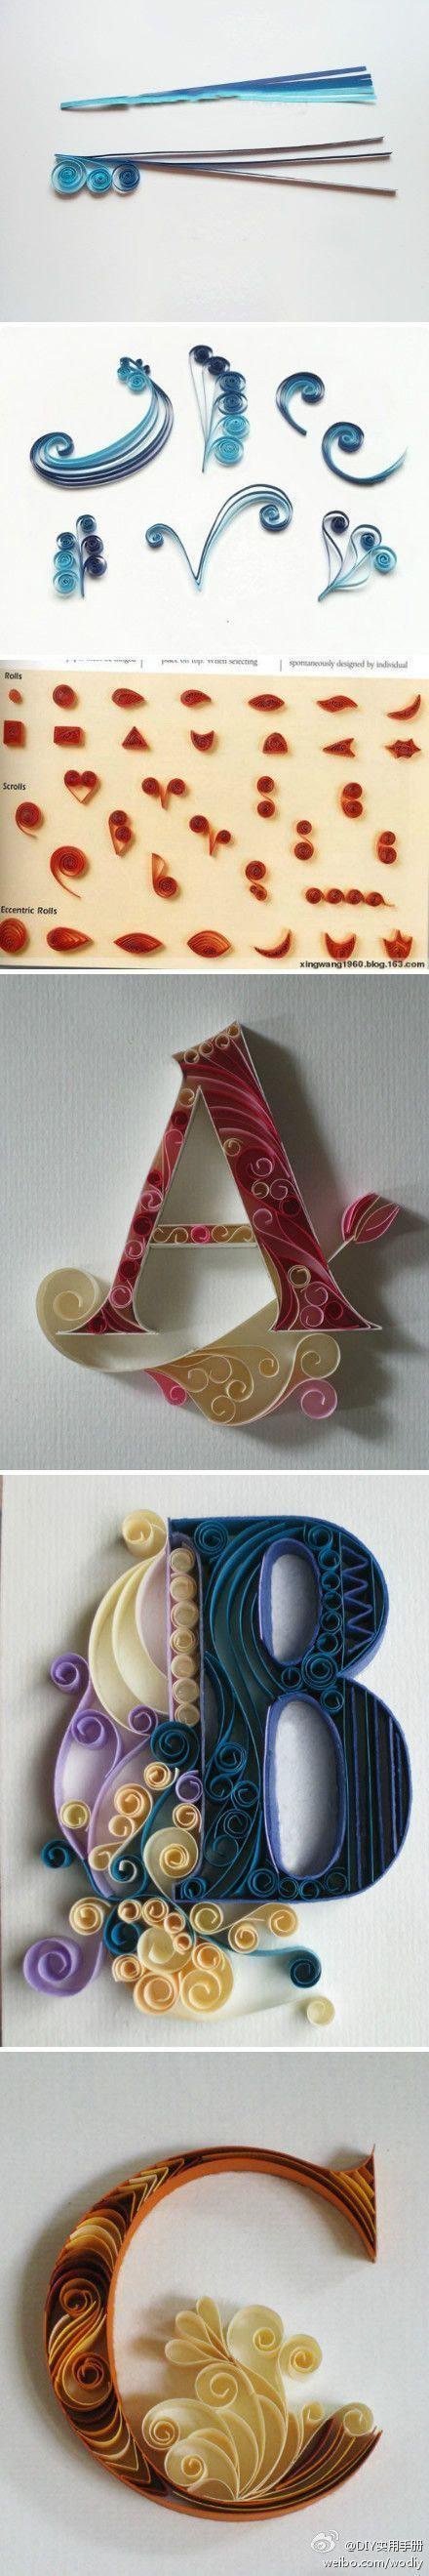 Beautiful Paper Art - Who - #Art #Beautiful #Paper / #art #Beautiful #Paper #paperquillingdesignsbeautiful #floconsdeneigeenpapier